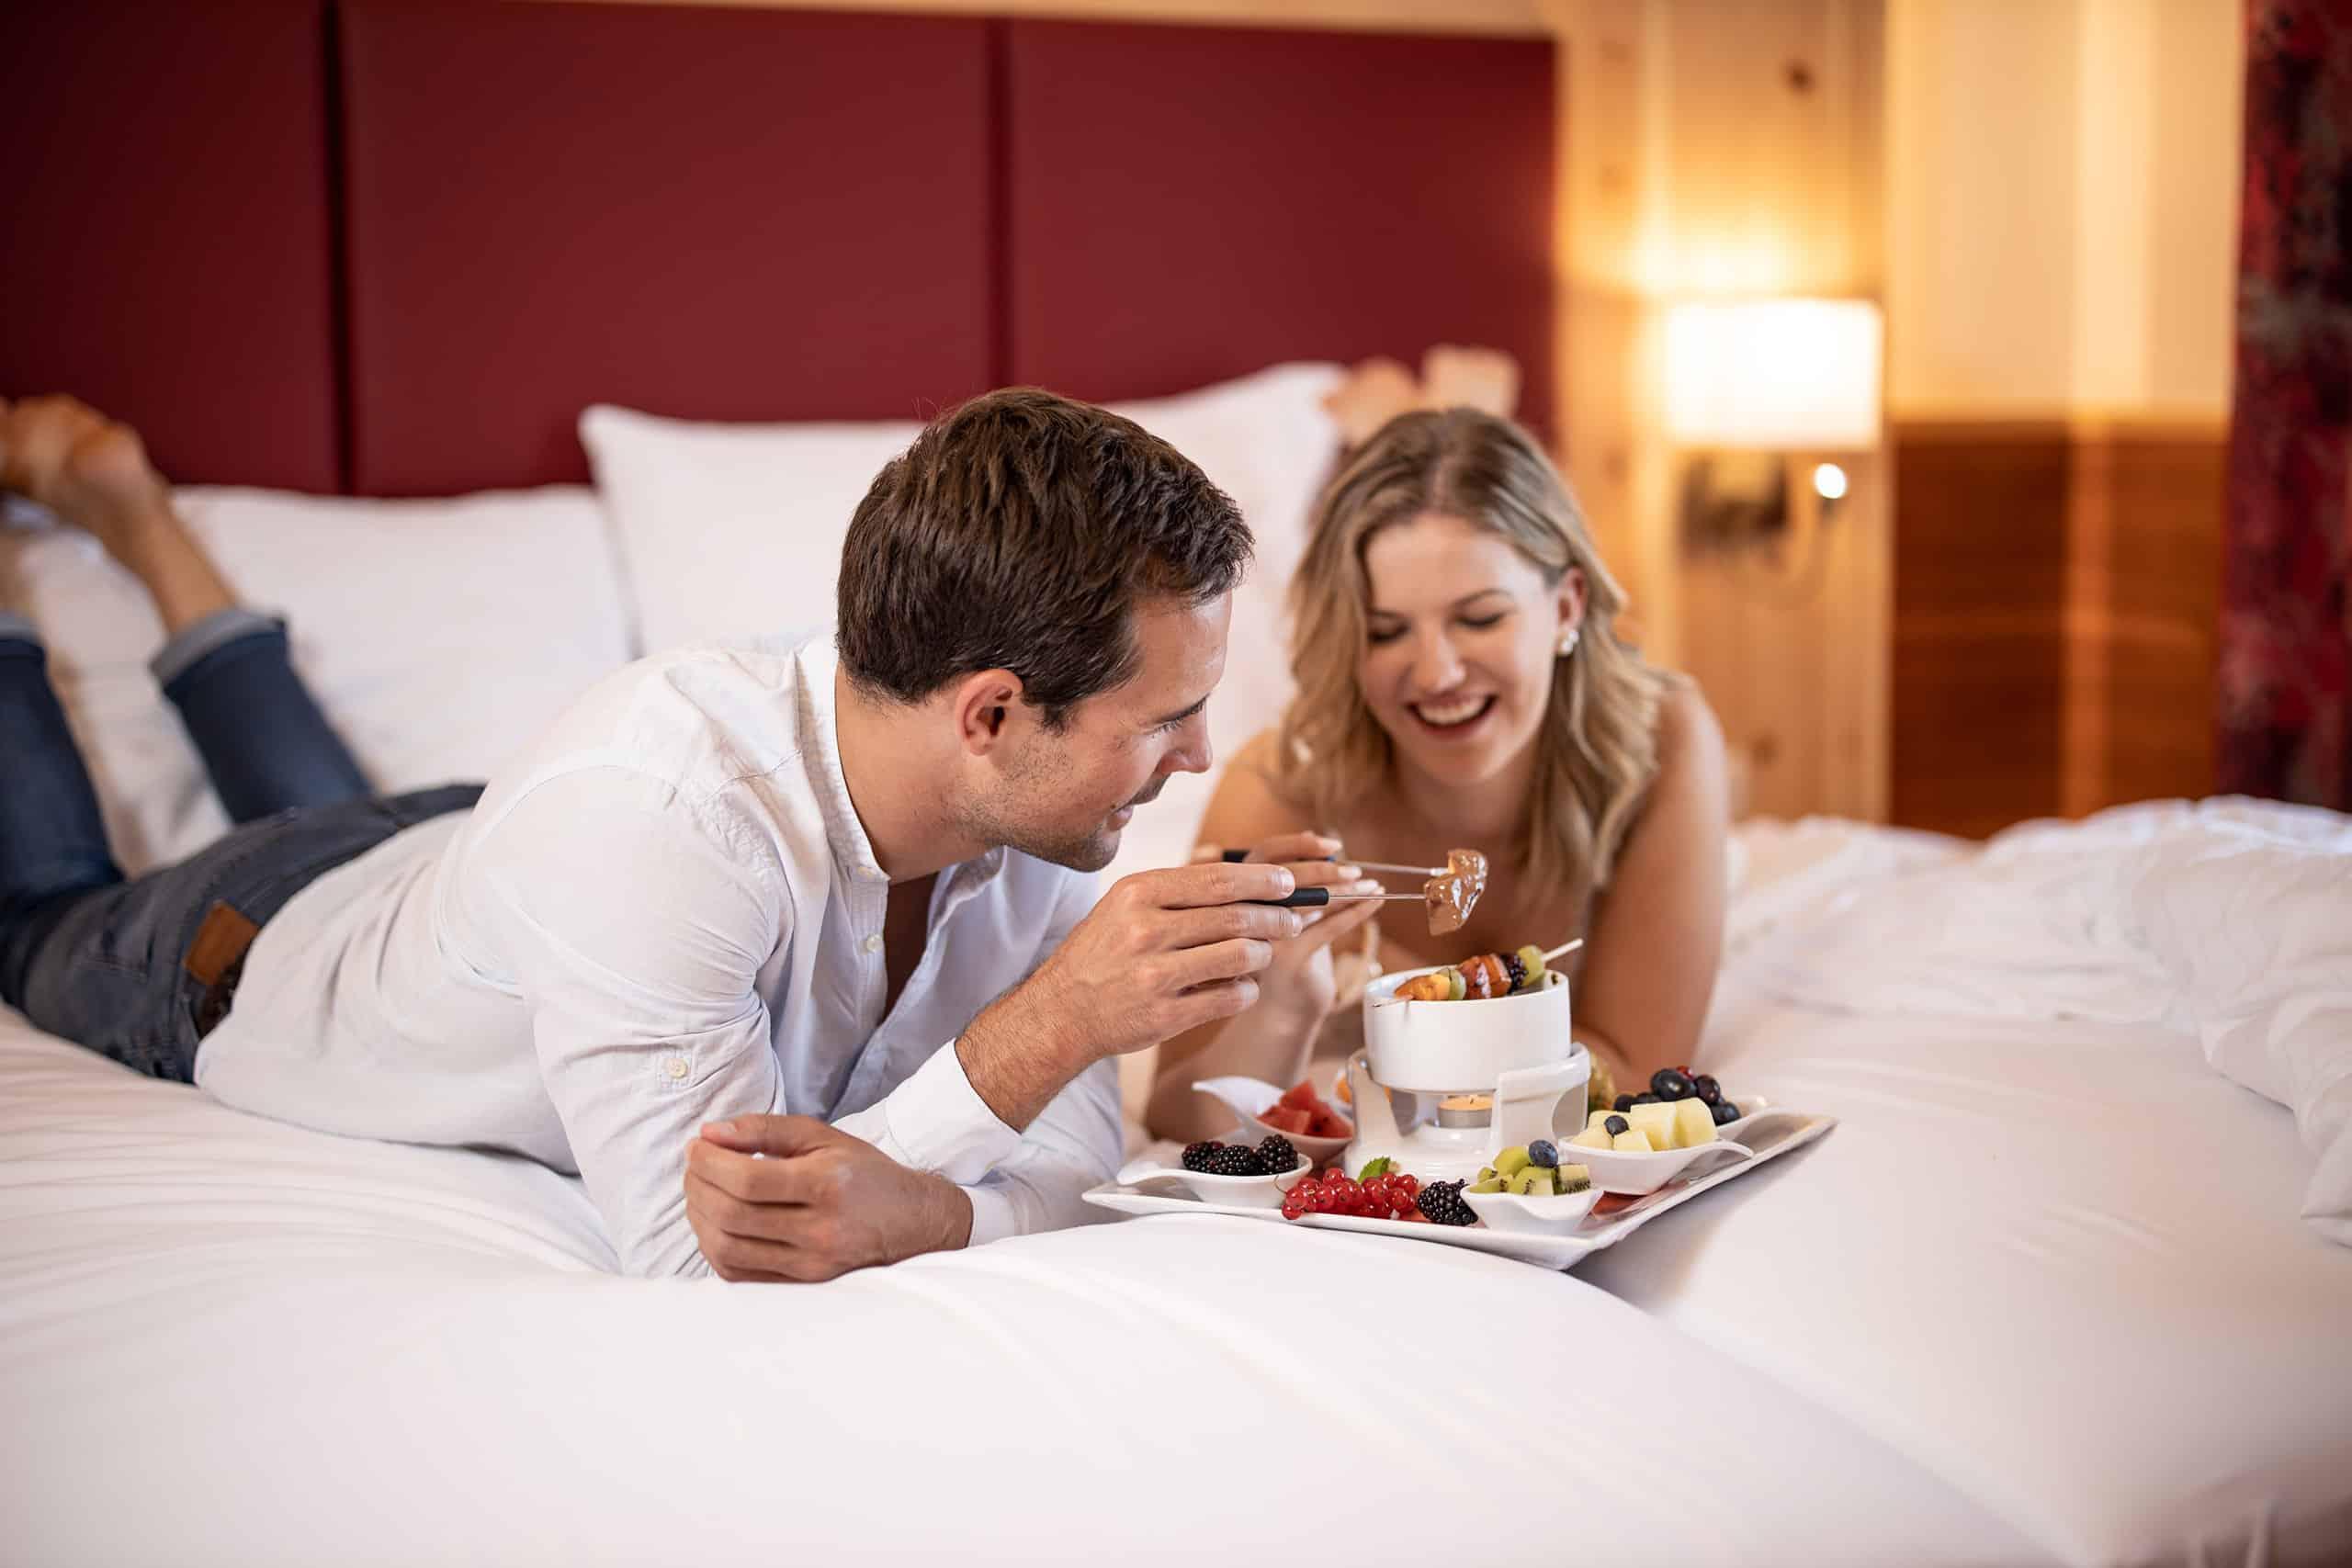 conversory-puchasplus-zirben-romantik-plus-zimmer-paar-schokoladenfondue